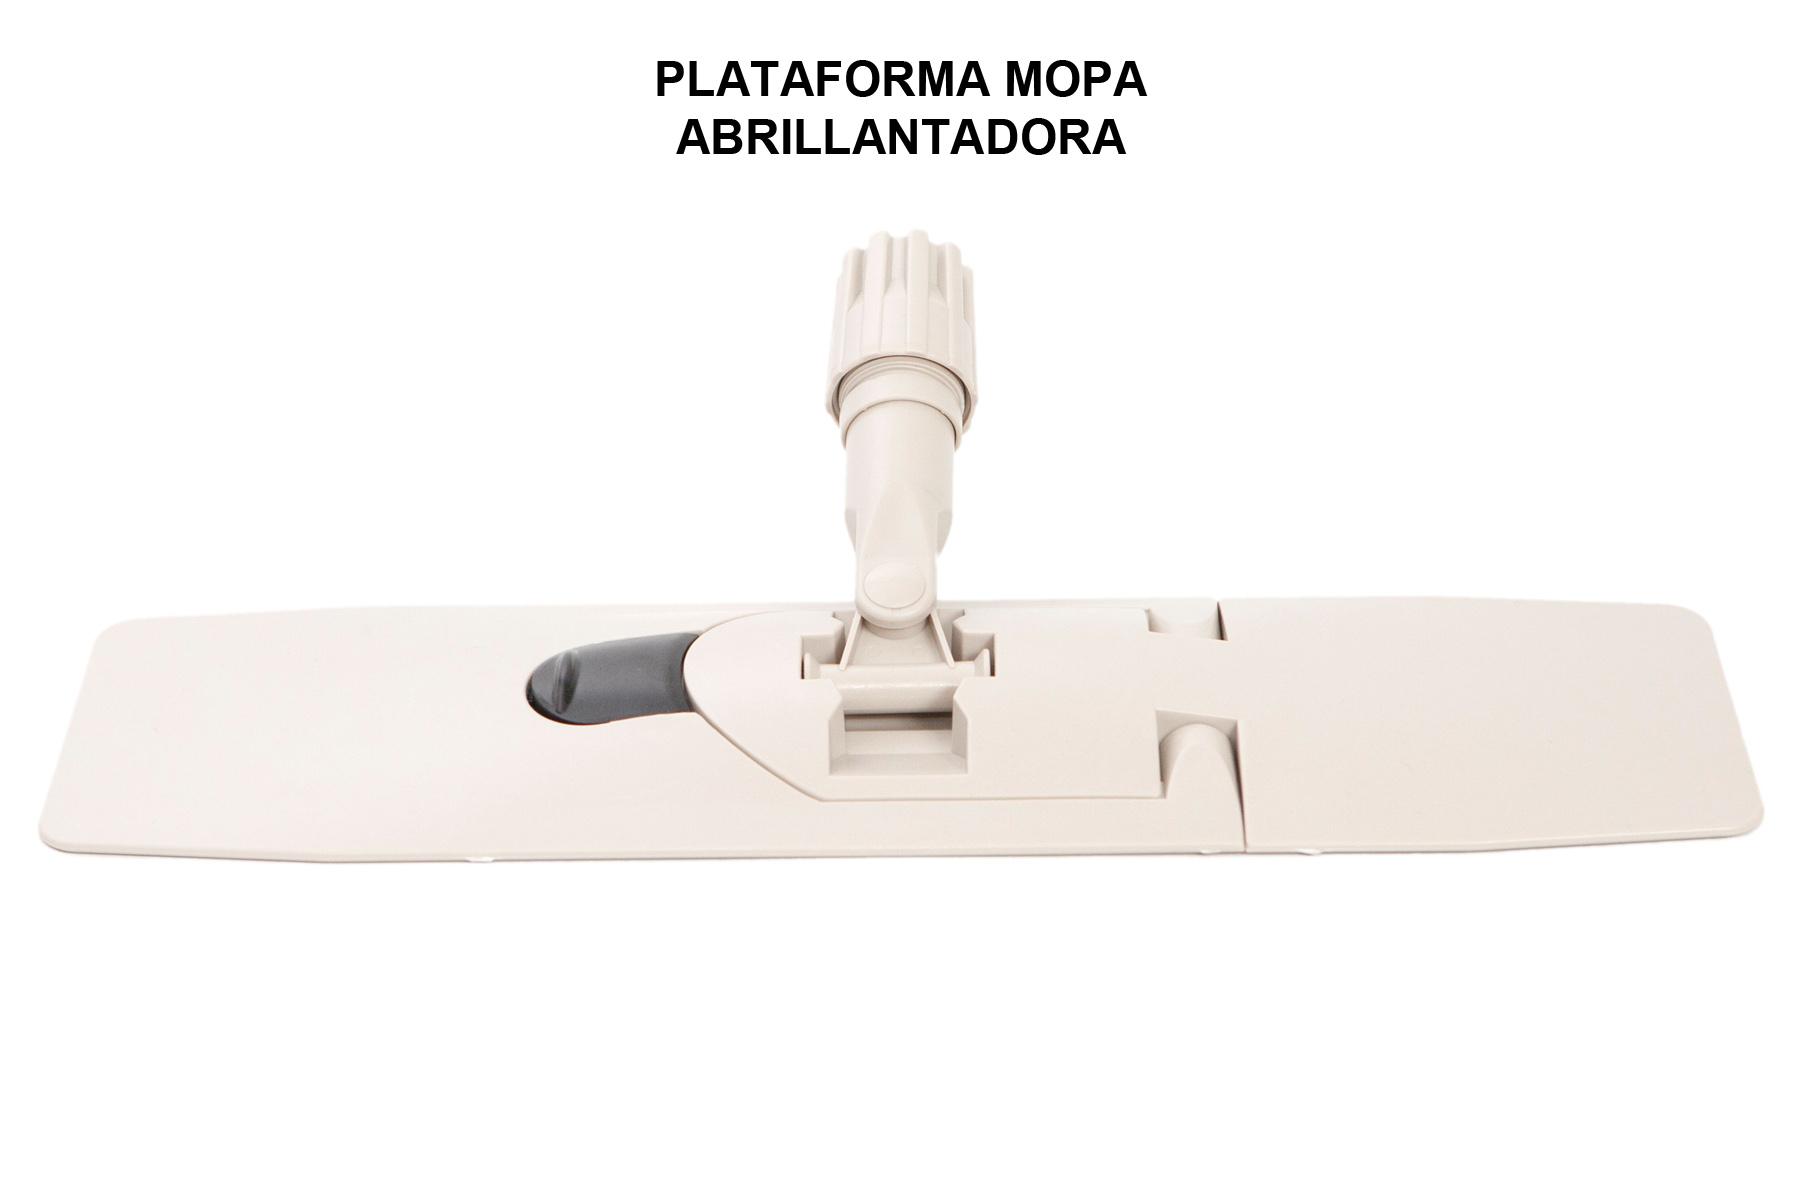 PLATAFORMA MOPA ABRILLANTADORA